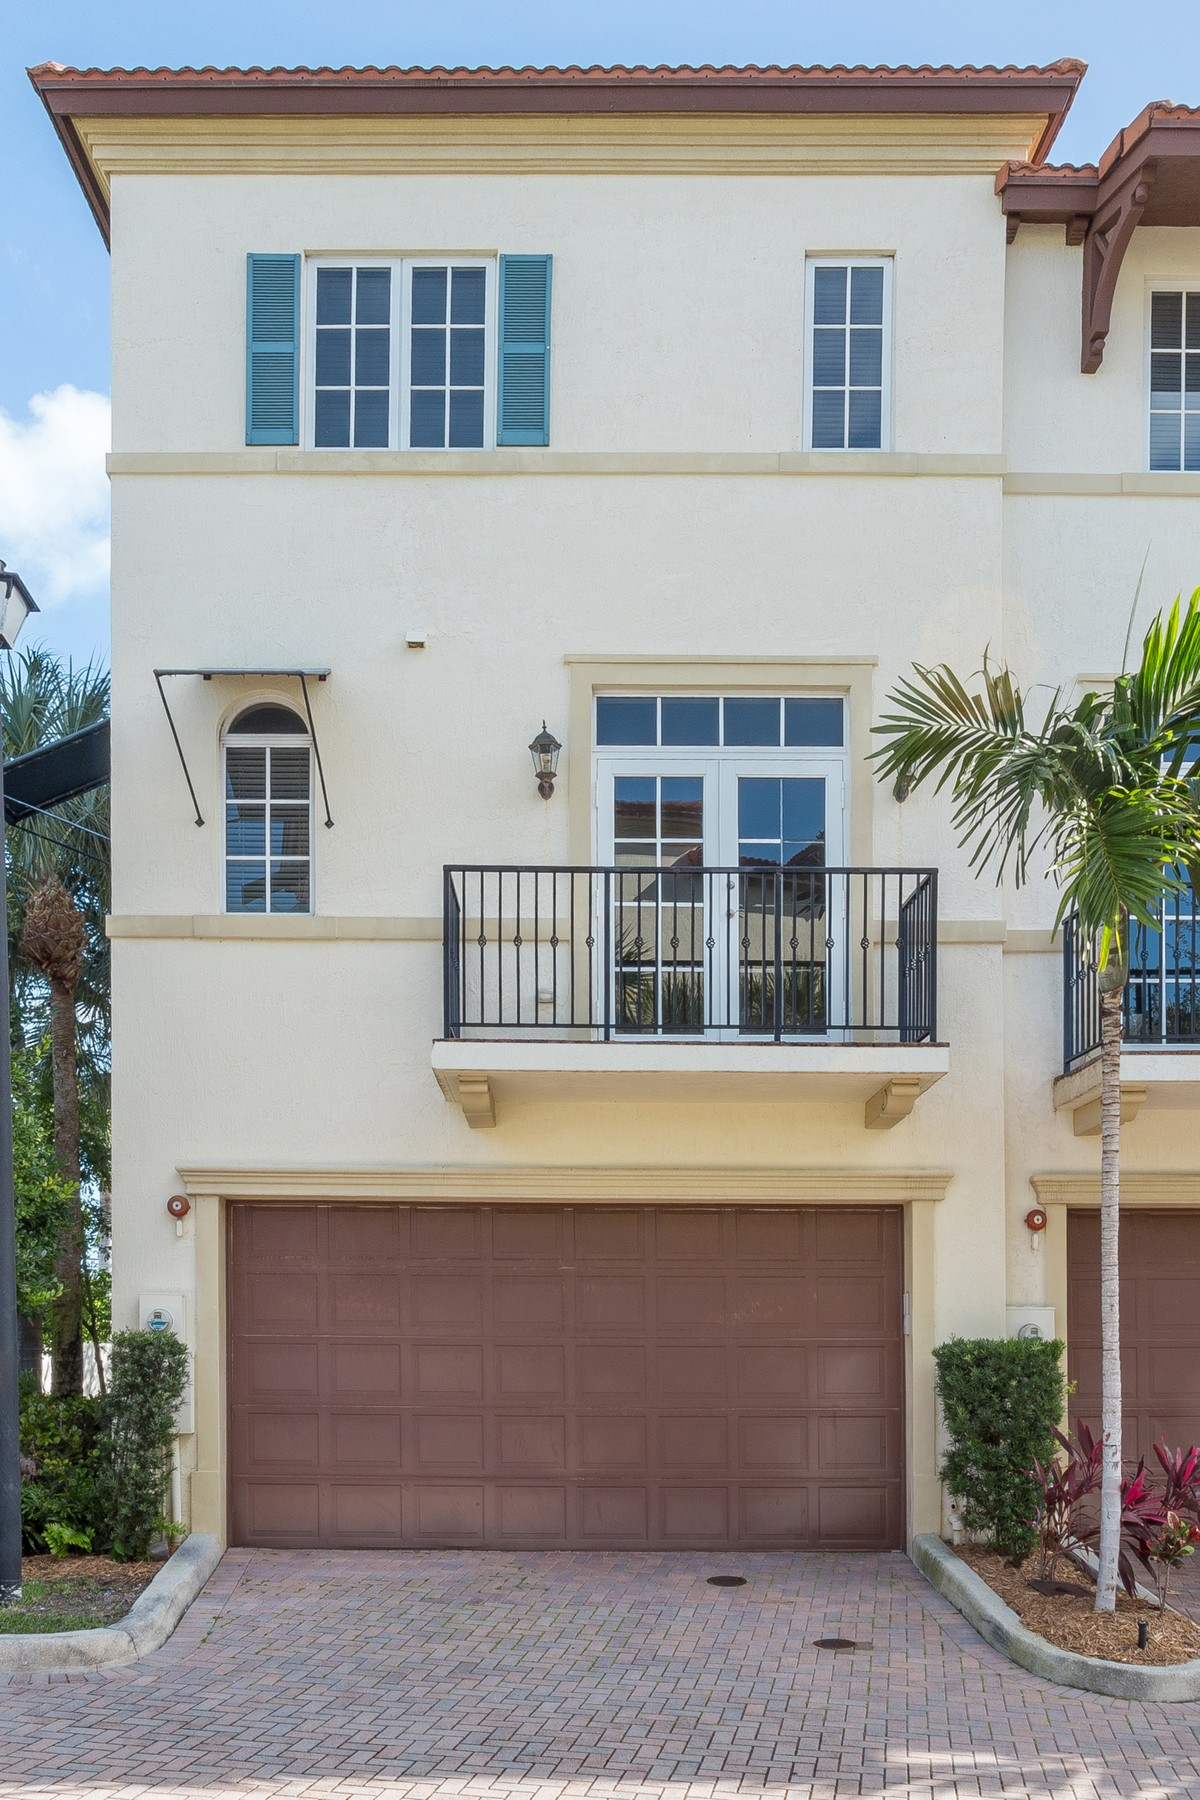 Townhouse for Sale at 3241 Estancia Ln , Boynton Beach, FL 33435 3241 Estancia Ln Boynton Beach, Florida, 33435 United States